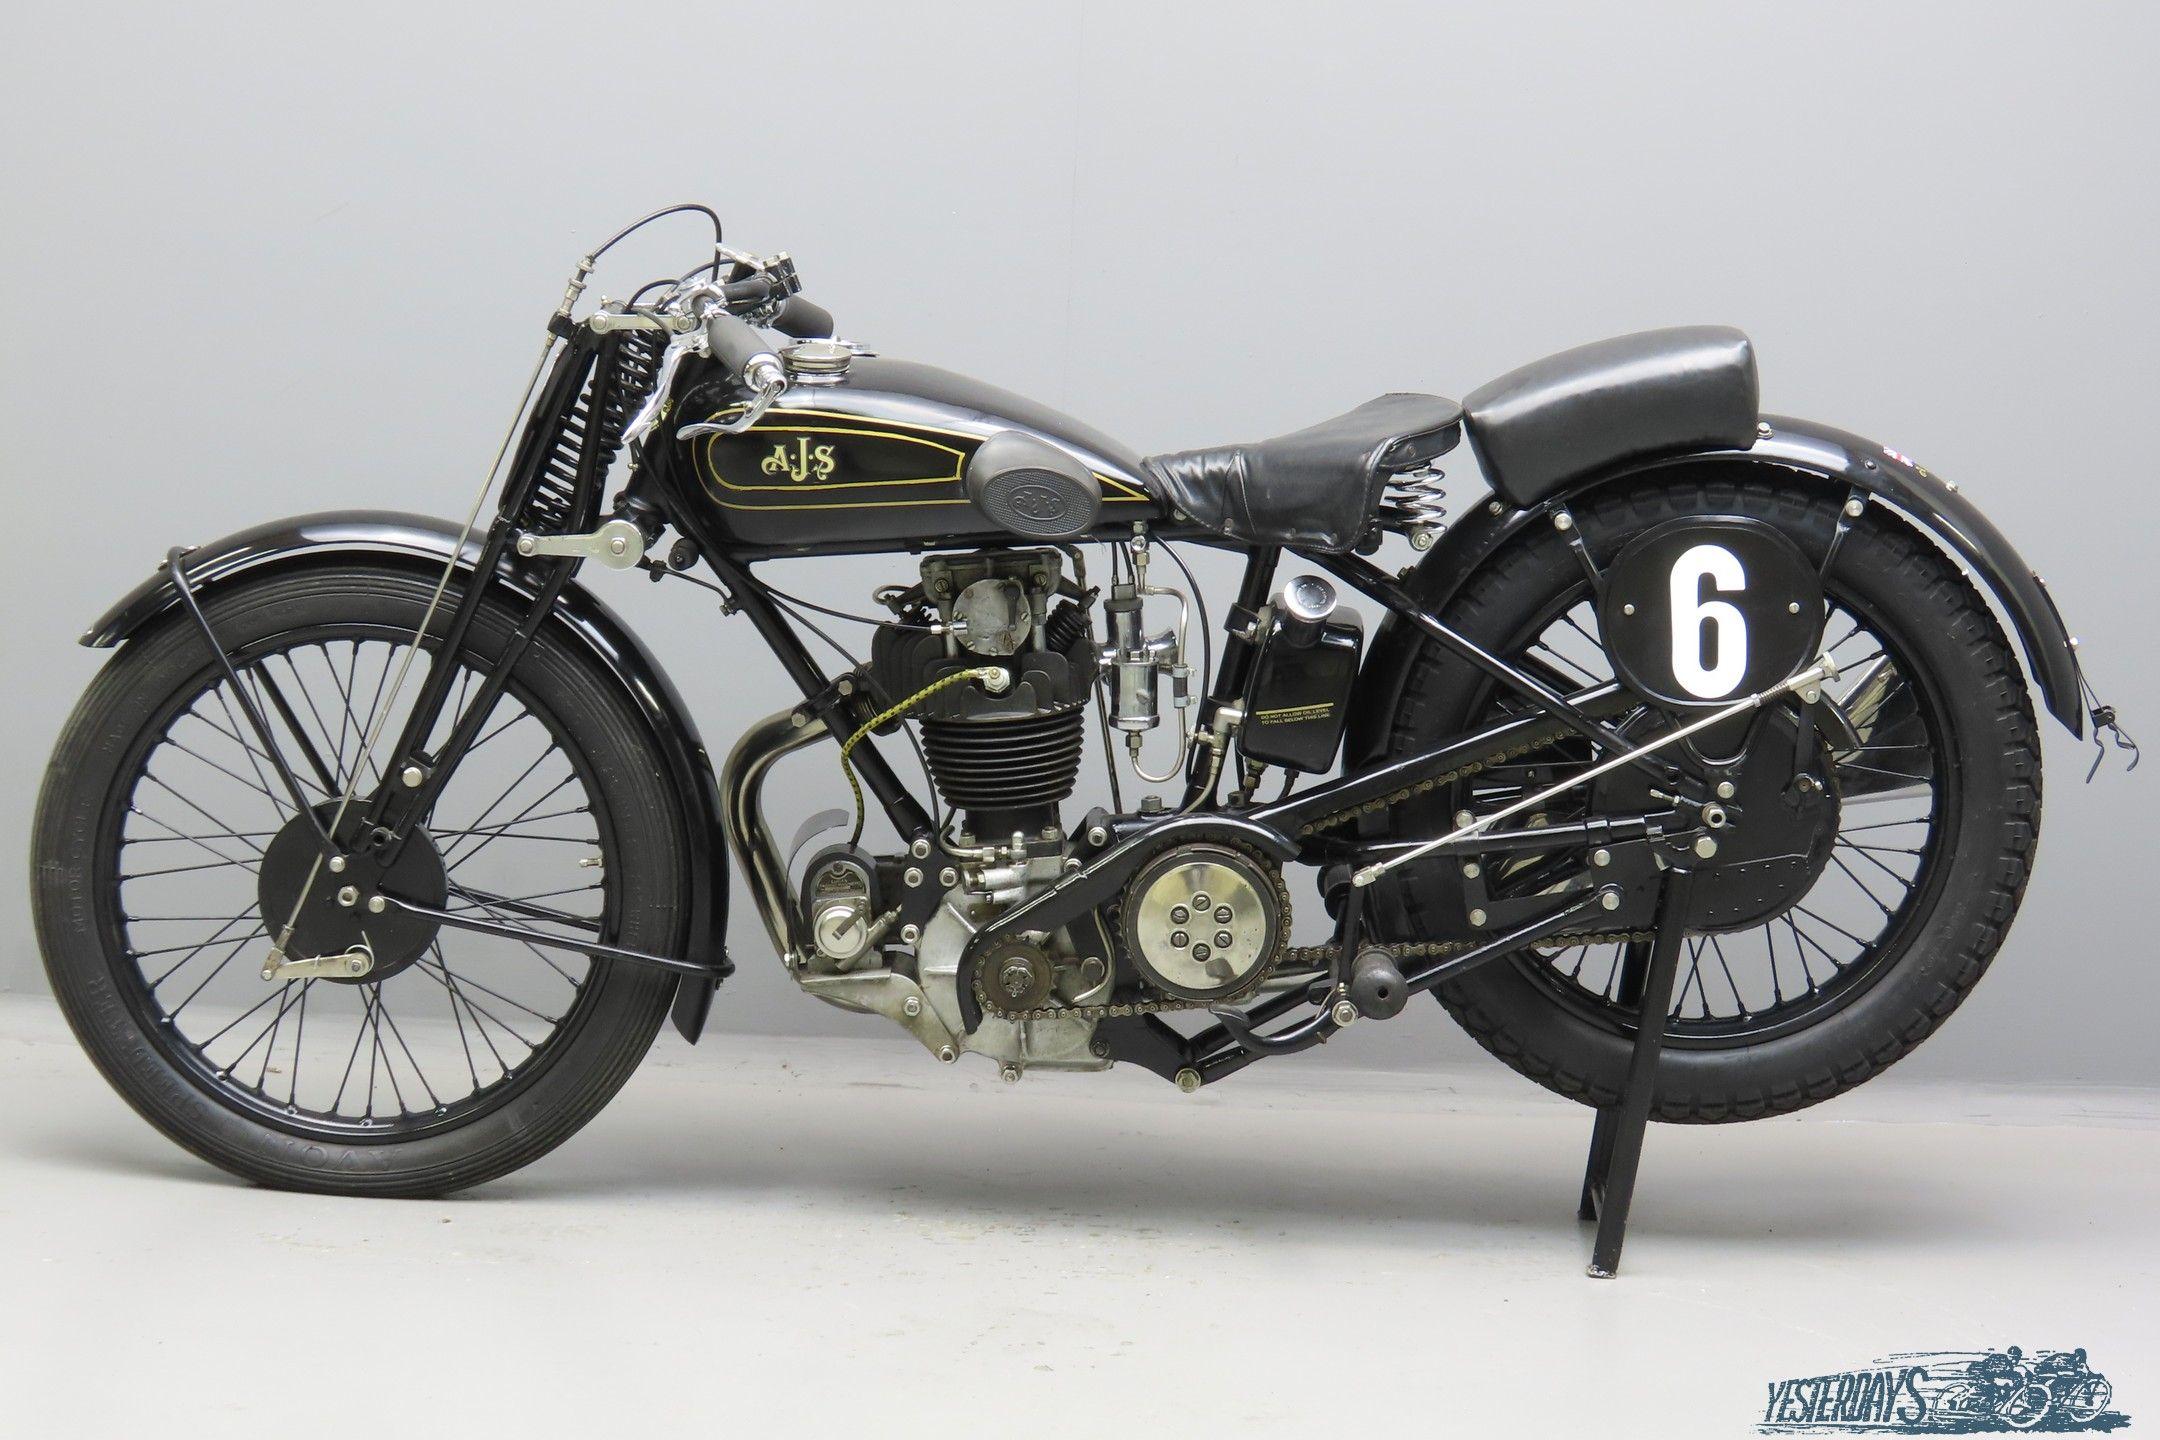 Ajs 1930 R7 349cc 1 Cyl Ohc 3010 Yesterdays British Motorcycles Ajs Motorcycles Sturmey Archer